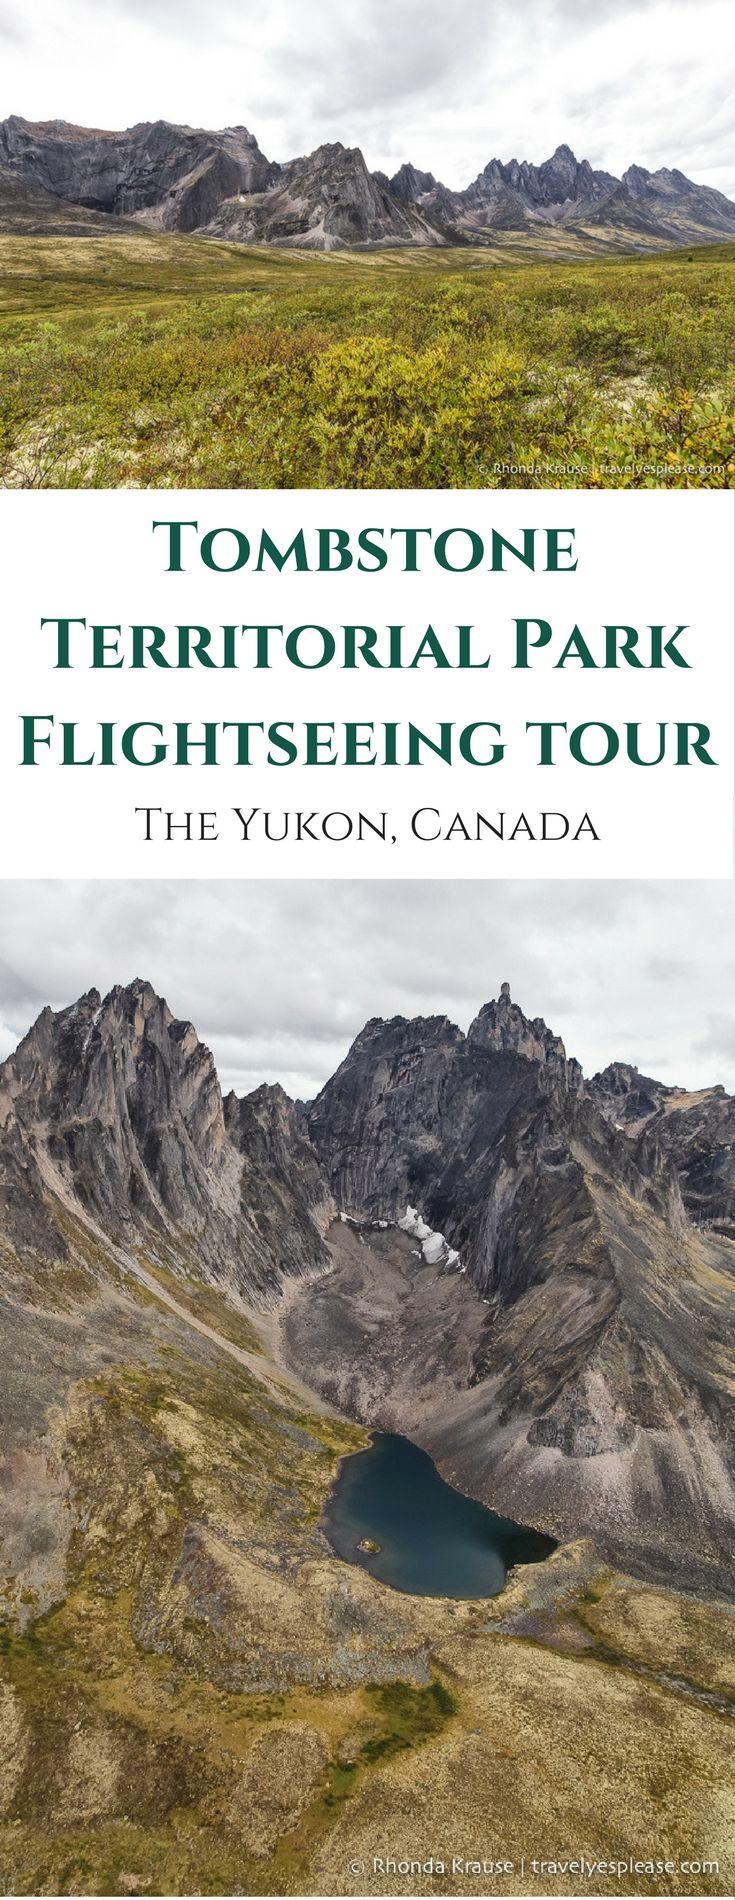 travelyesplease.com | Tombstone Territorial Park Flightseeing Tour- The Yukon, Canada (Blog Post)